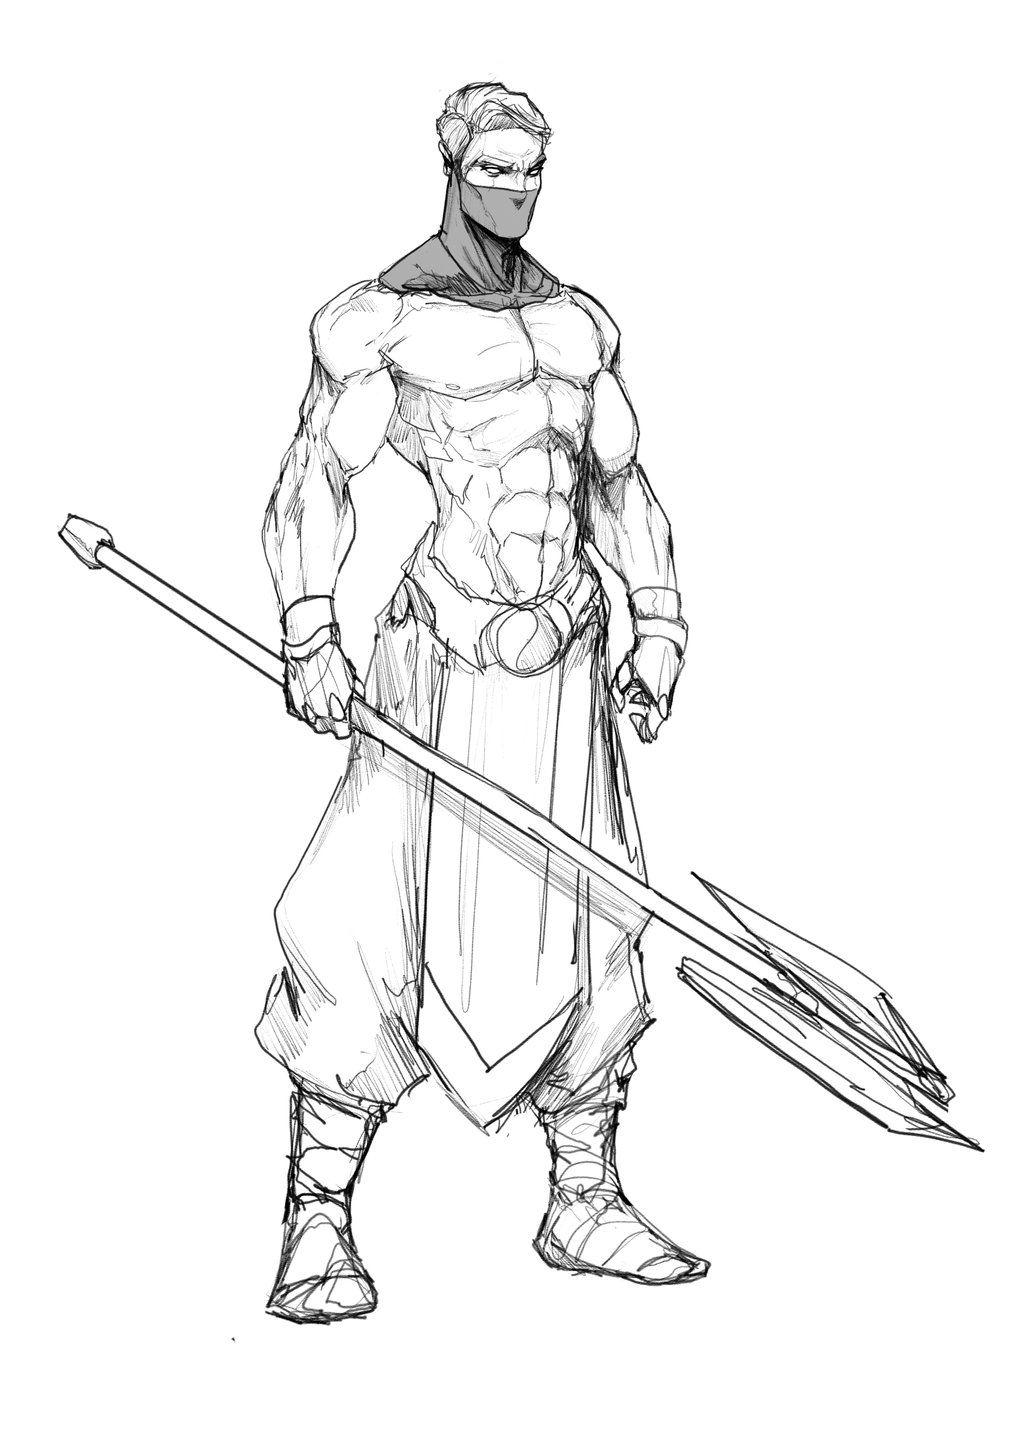 Another Ninja Dude By Sketchydeezdeviantartcom On At Deviantart